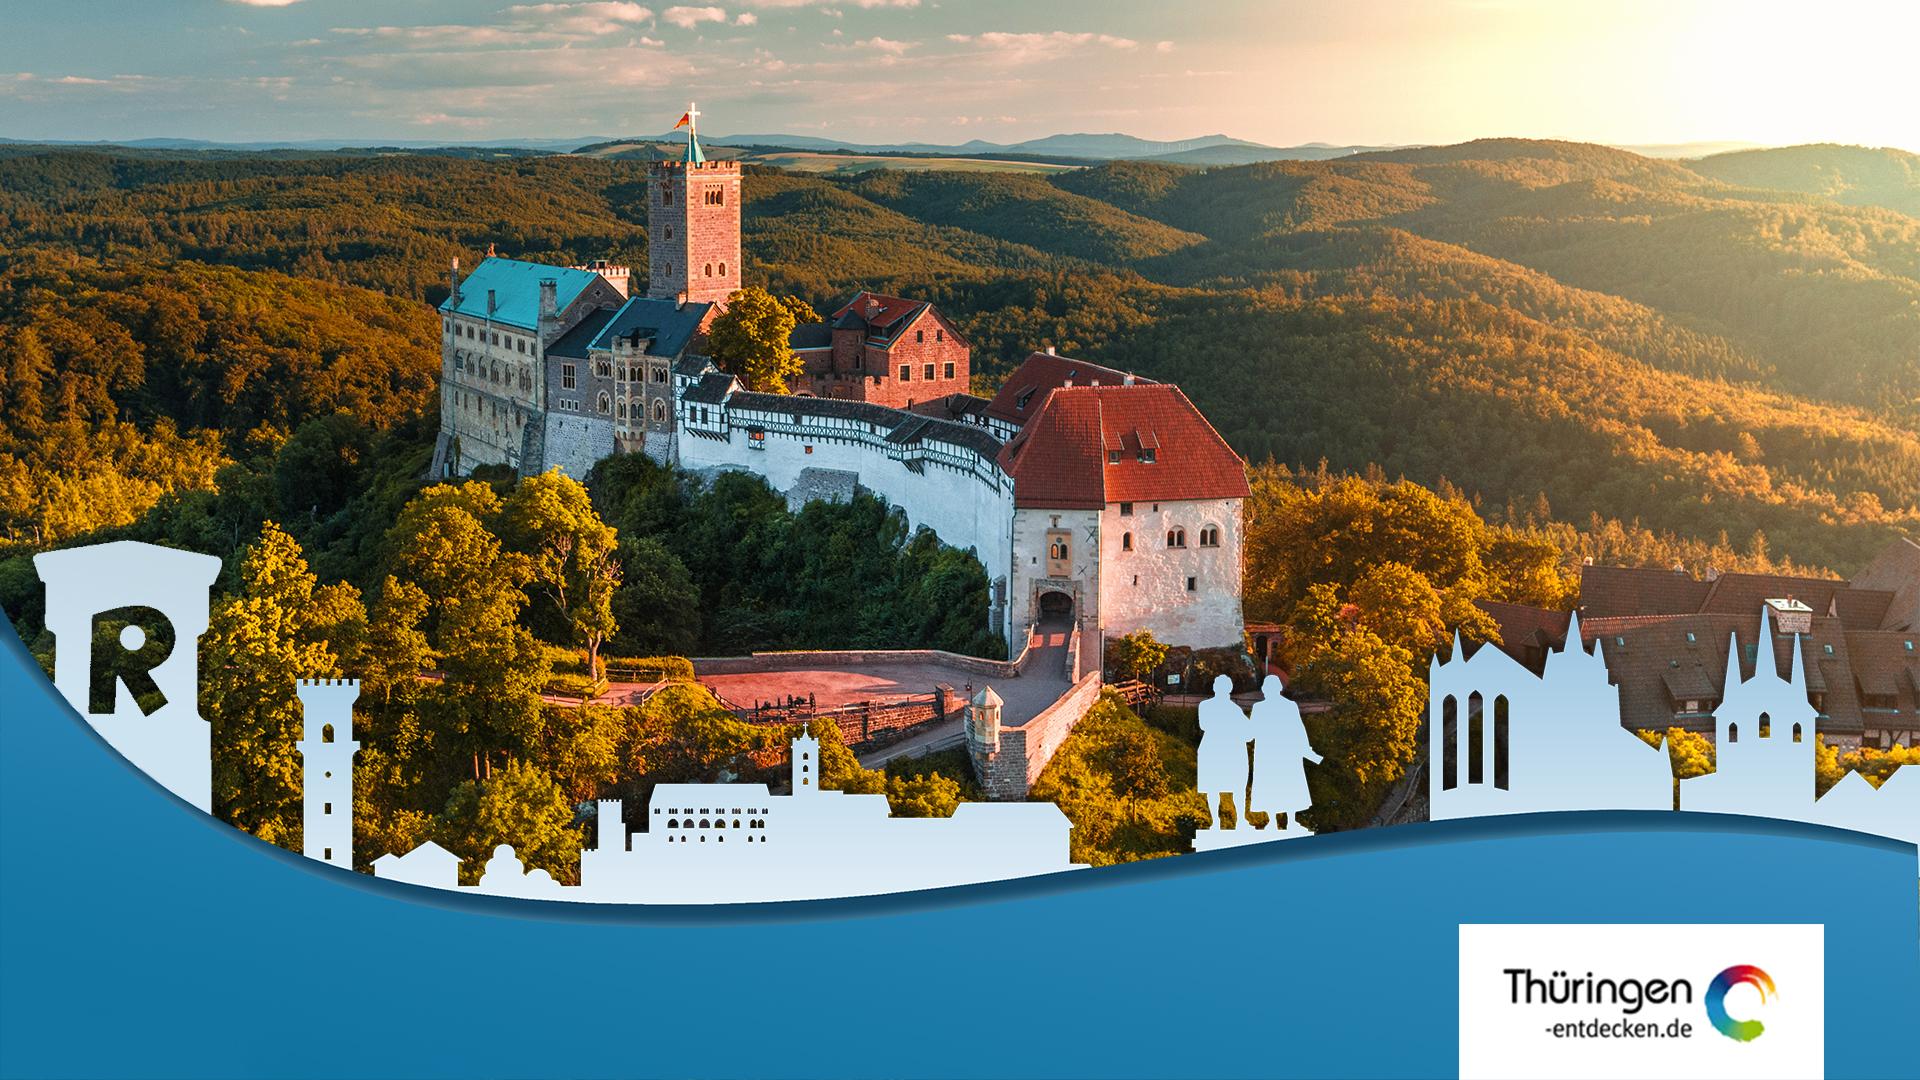 Luftaufnahme der Wartburg in Eisenach, Thumbnail youtube